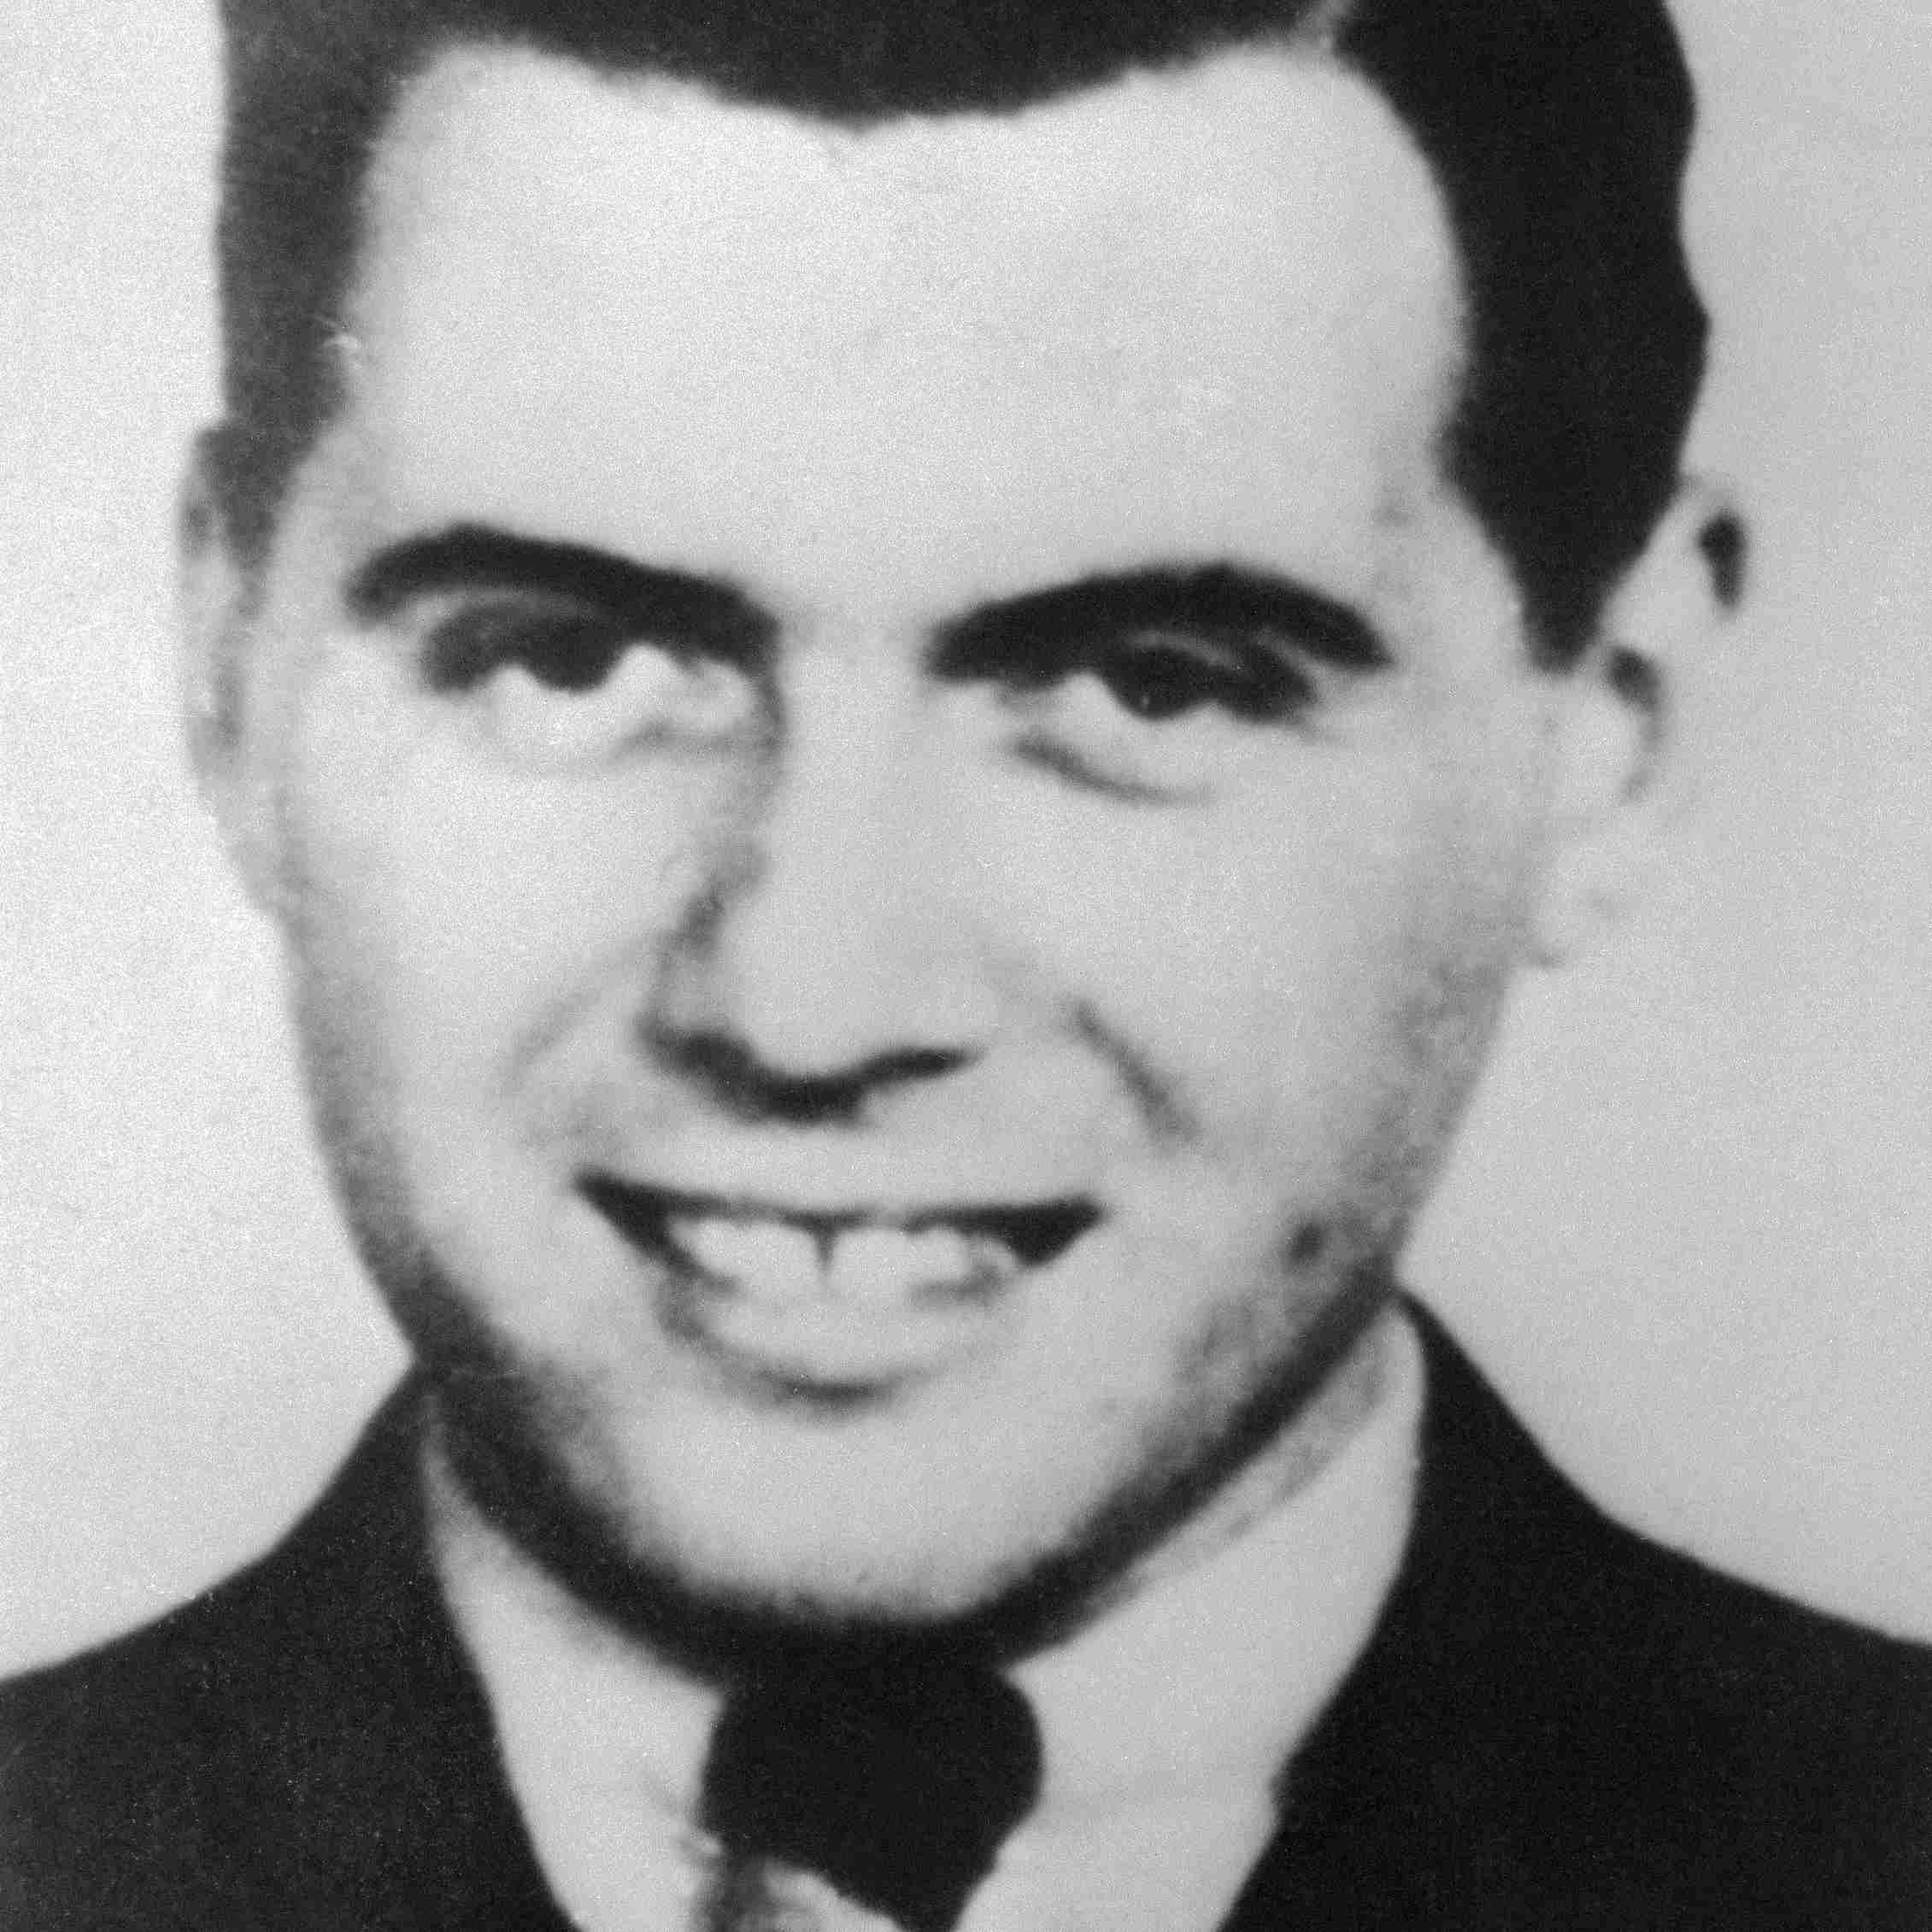 Black and white photograph of Joseph Mengele.